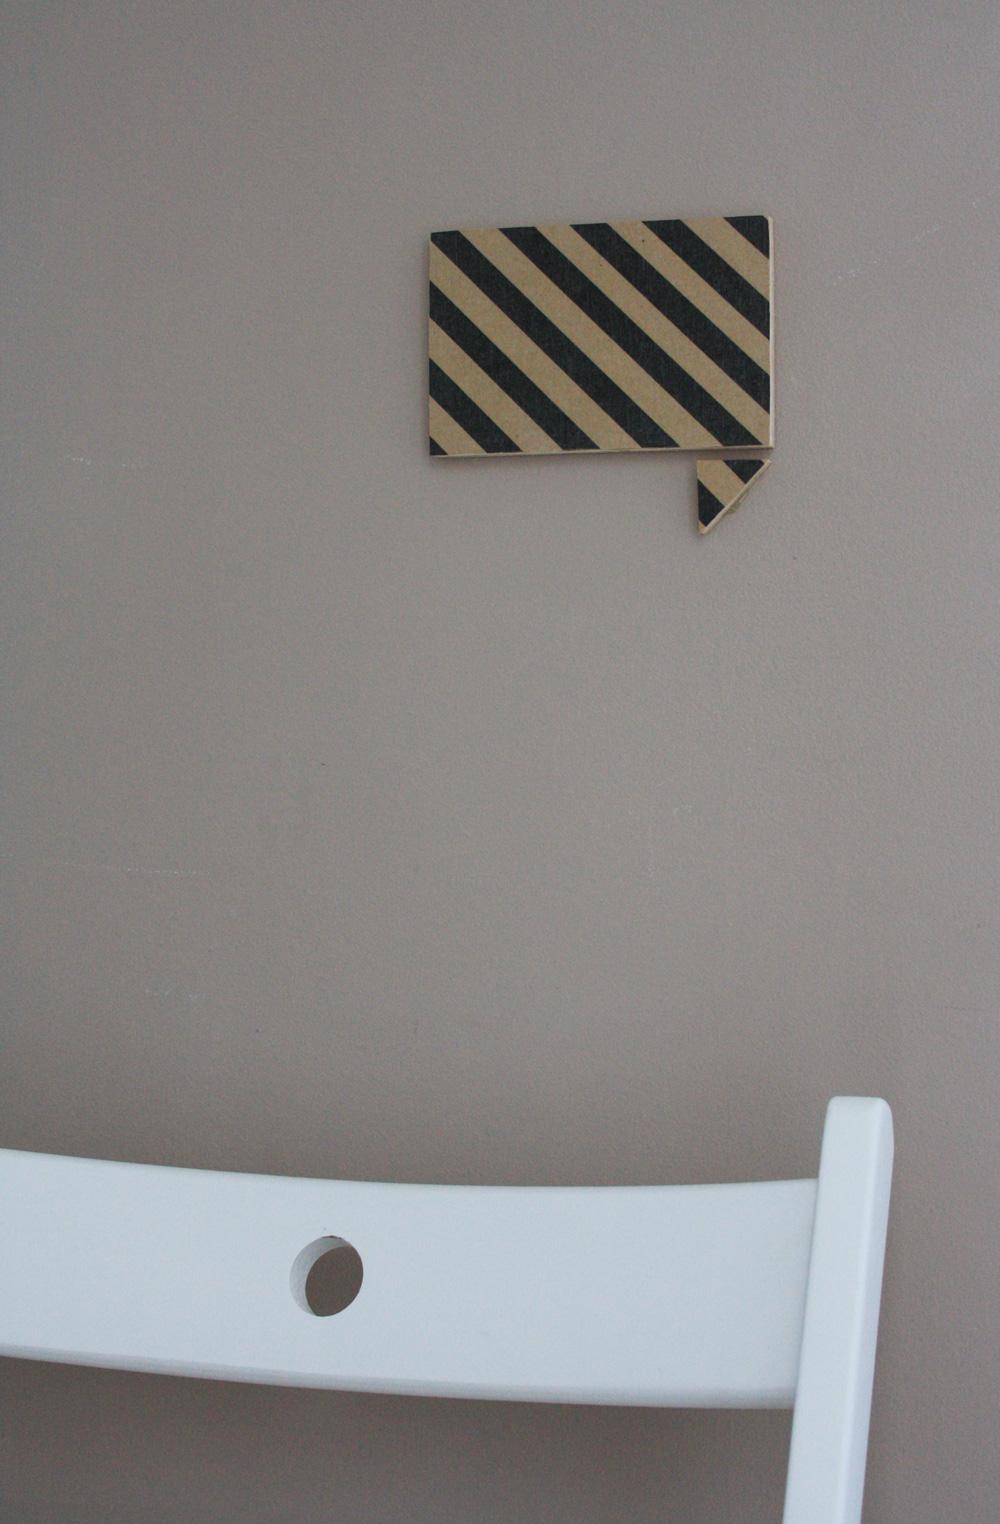 IKEA HACK: Terje Klappstuhl Aufhängung